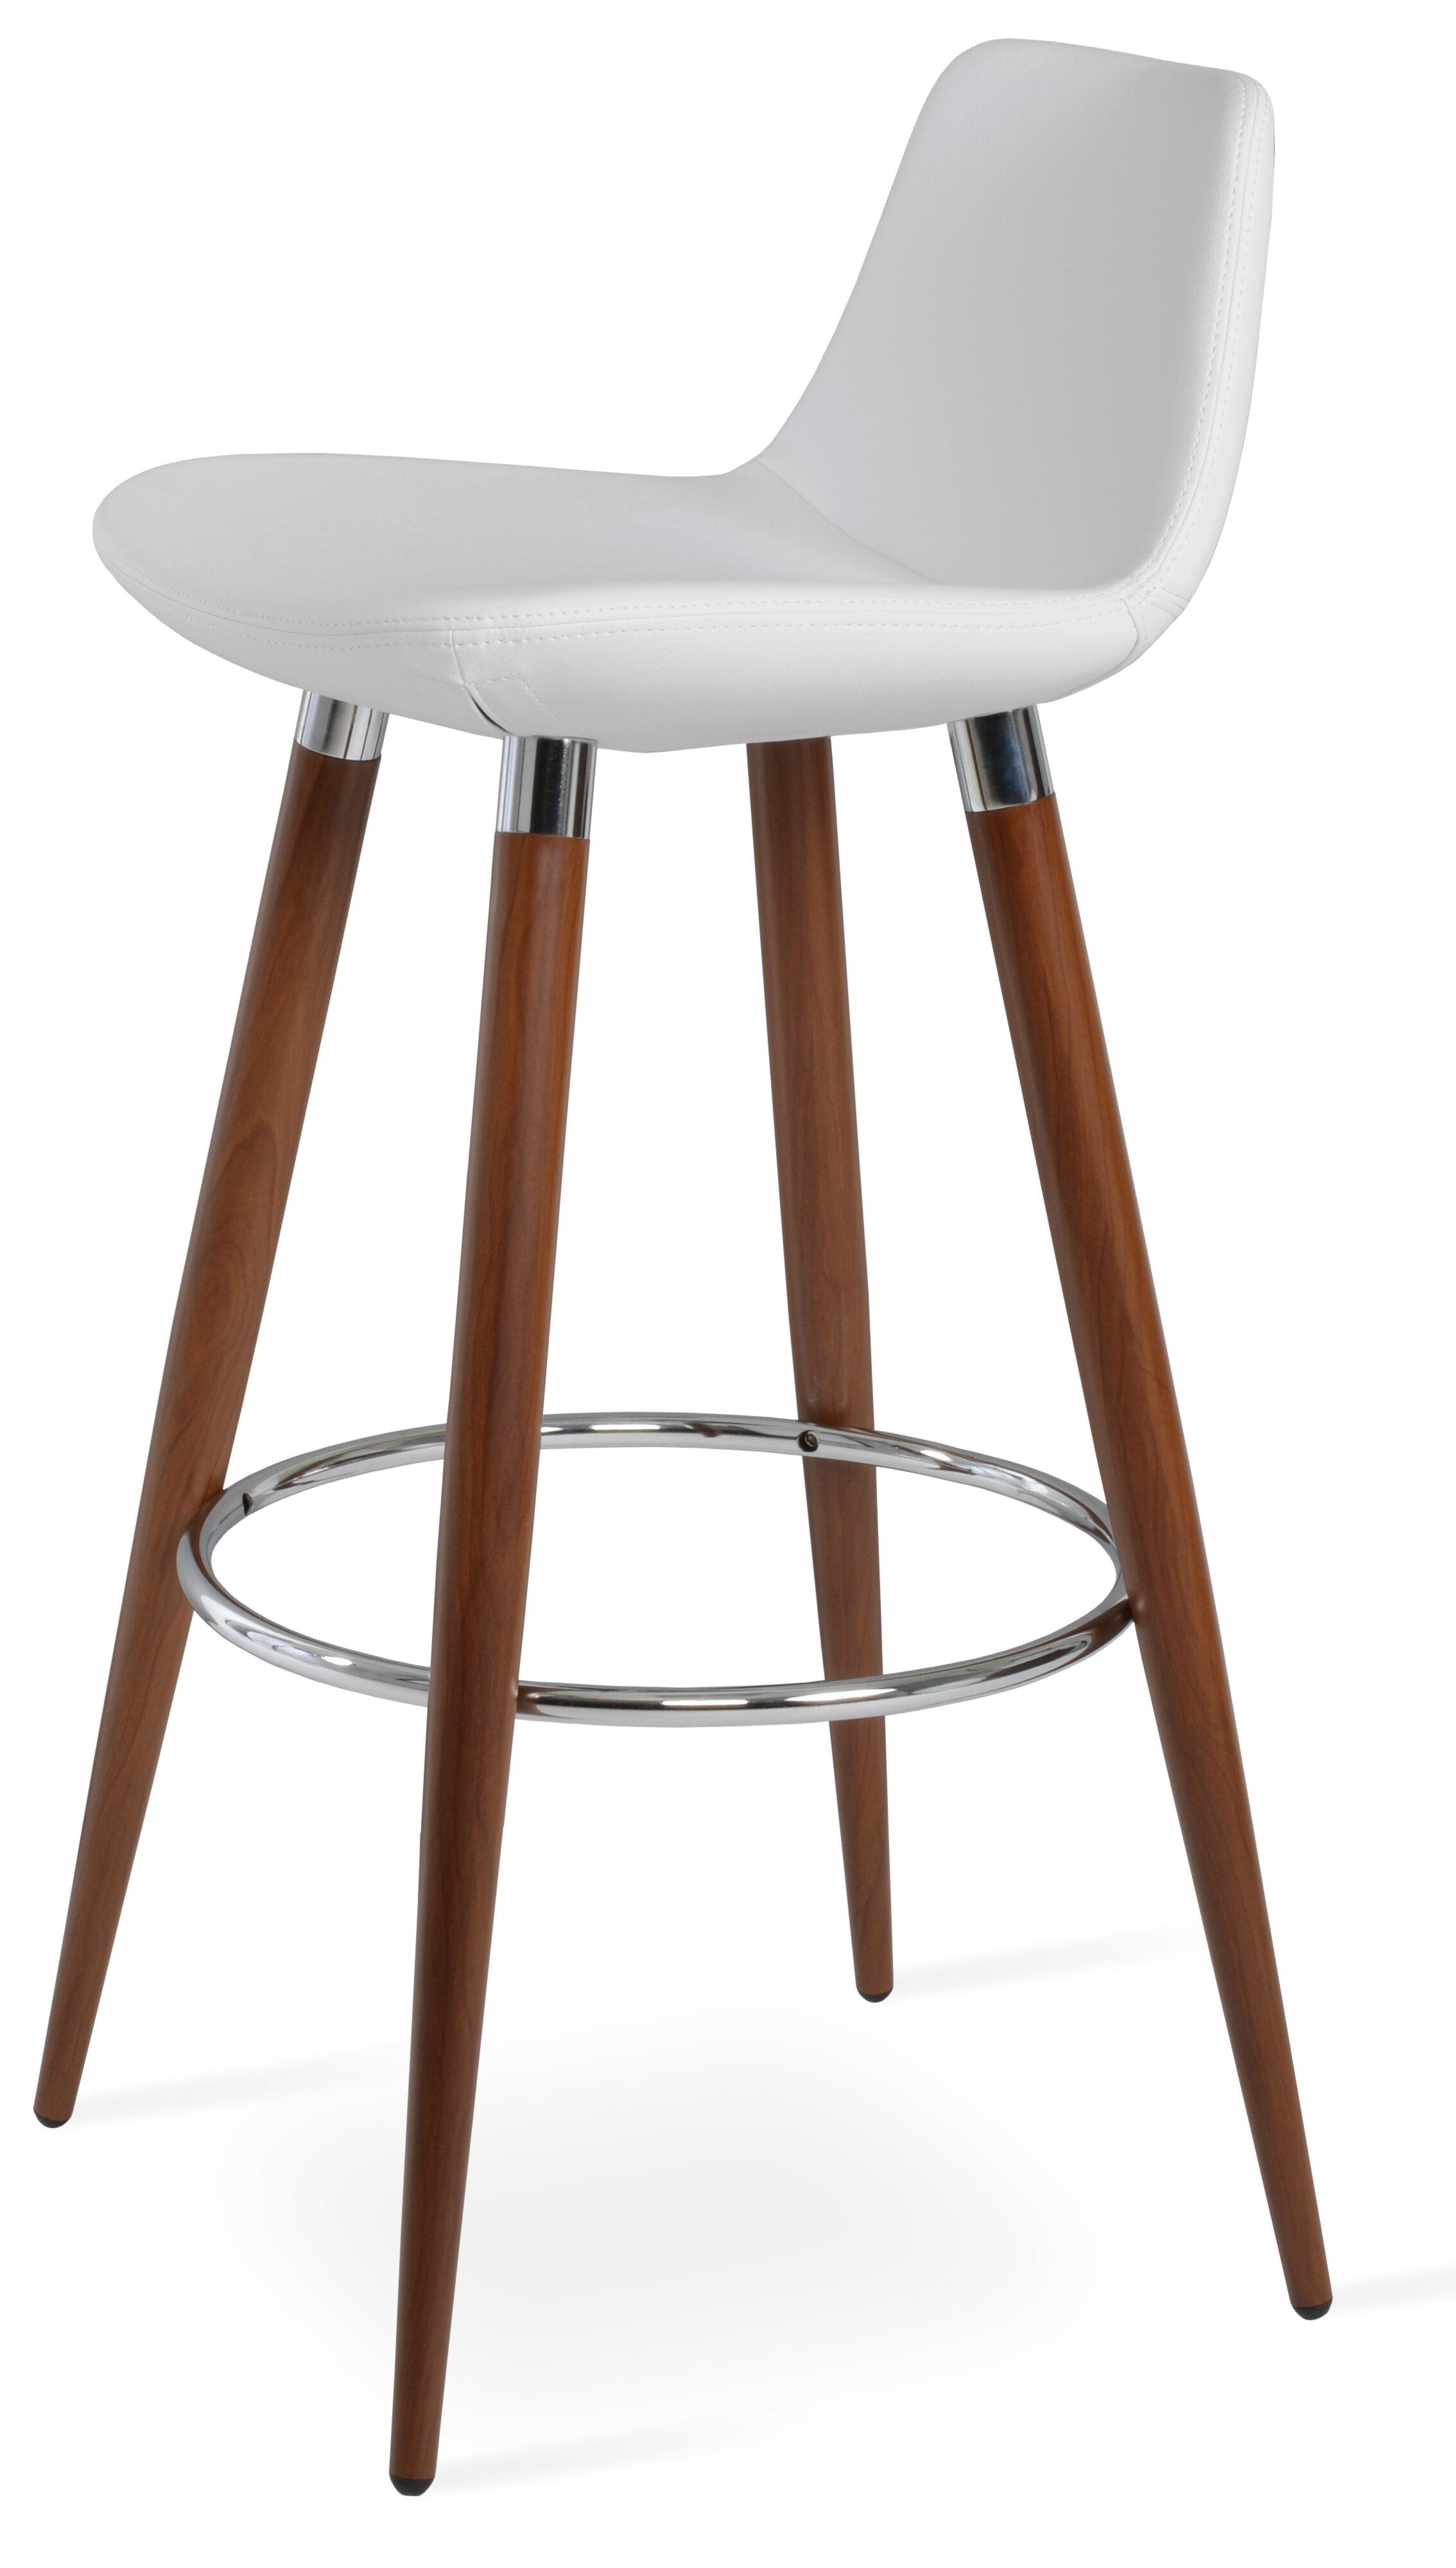 Remarkable Pera Ana Bar Stool Inzonedesignstudio Interior Chair Design Inzonedesignstudiocom